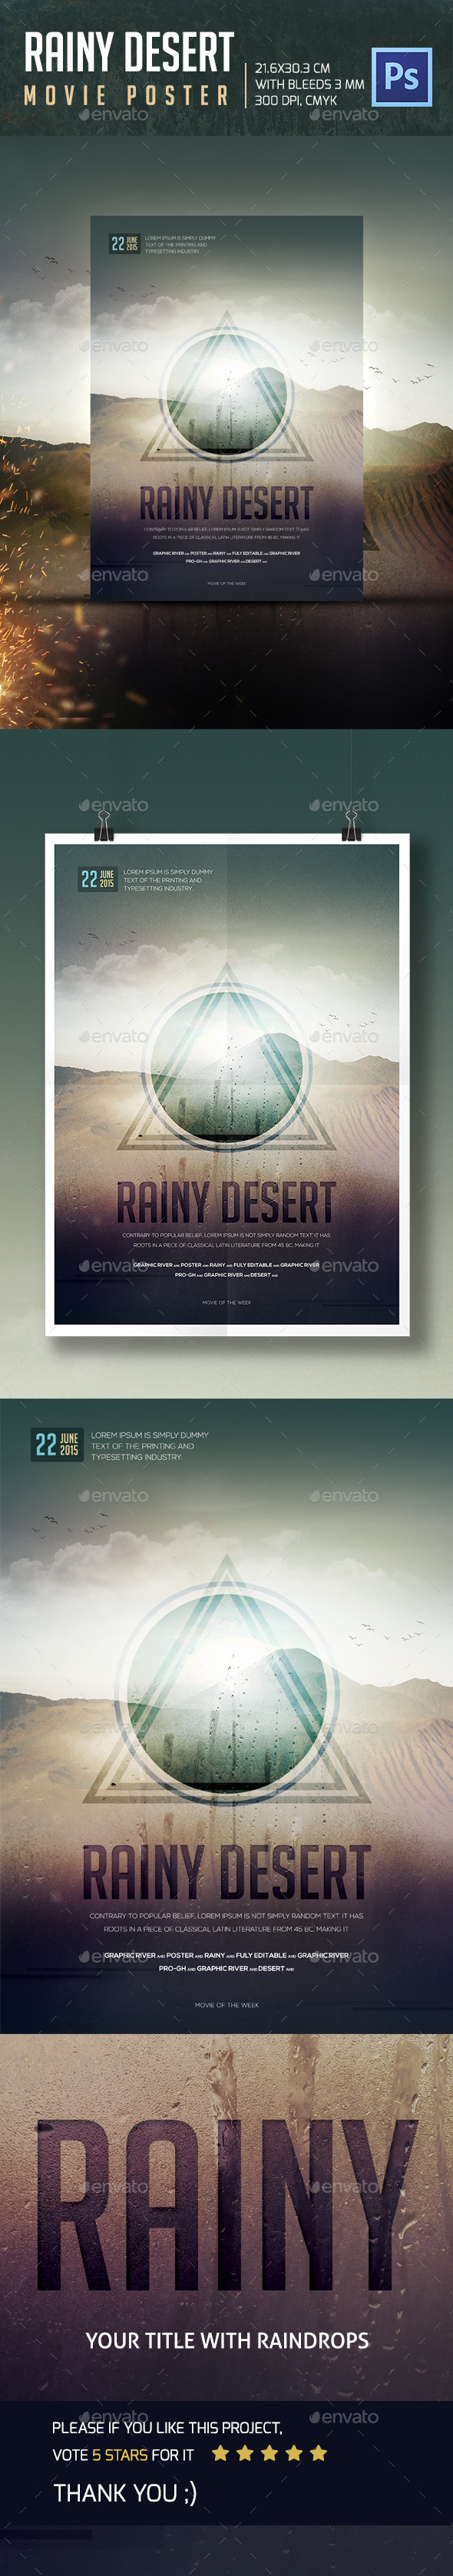 Rainy Desert Movie Poster - Events Flyers